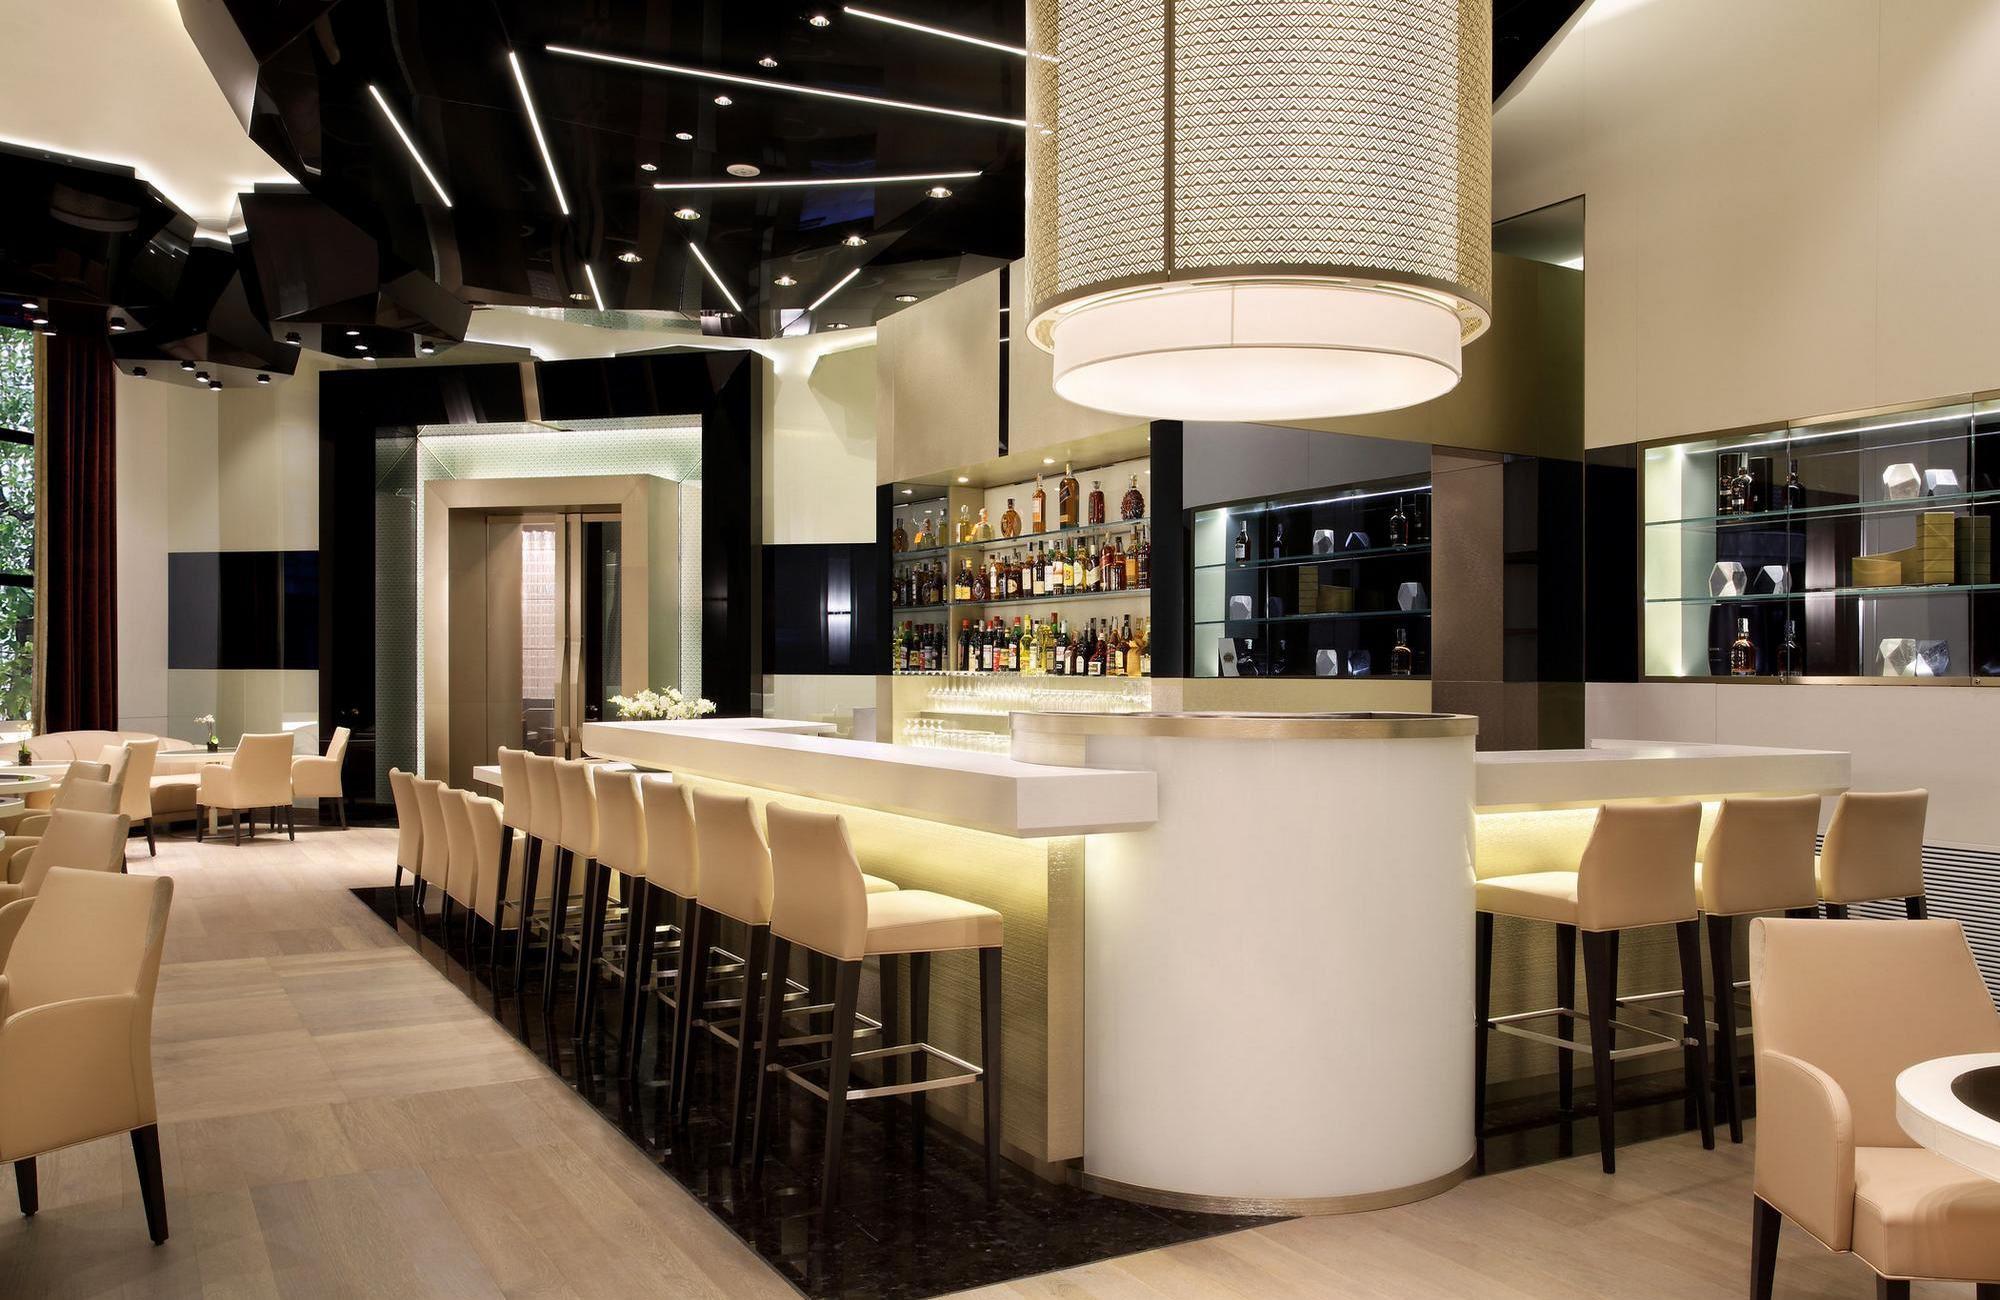 Gallia Lounge  Bar Excelsior Hotel Gallia a Luxury